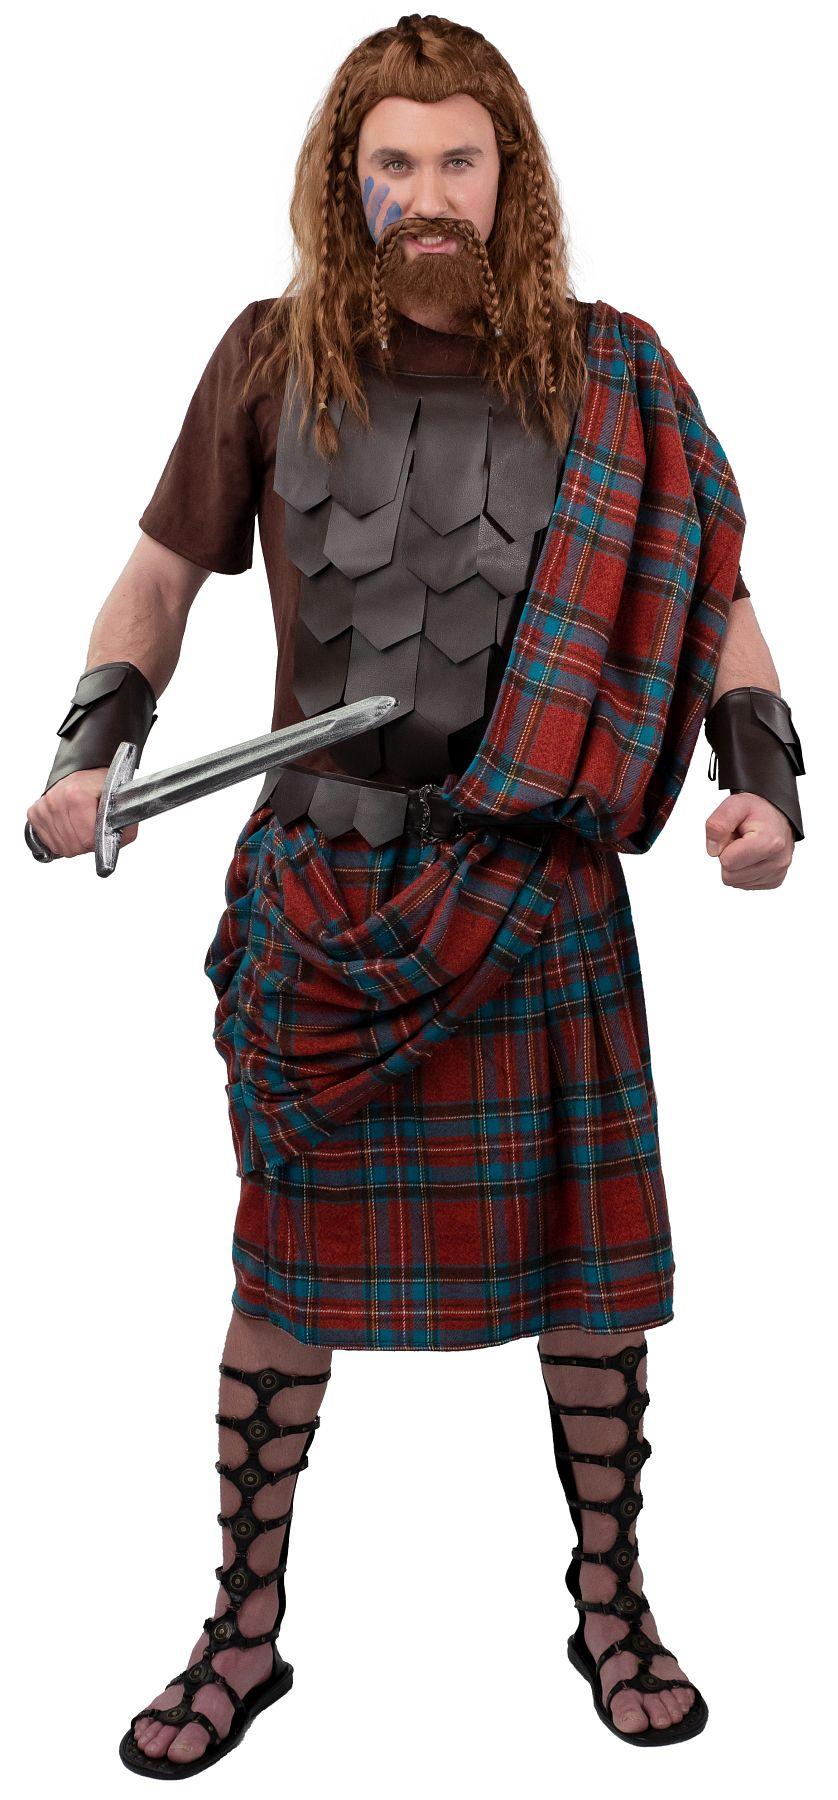 Kostüm Highlander Deluxe